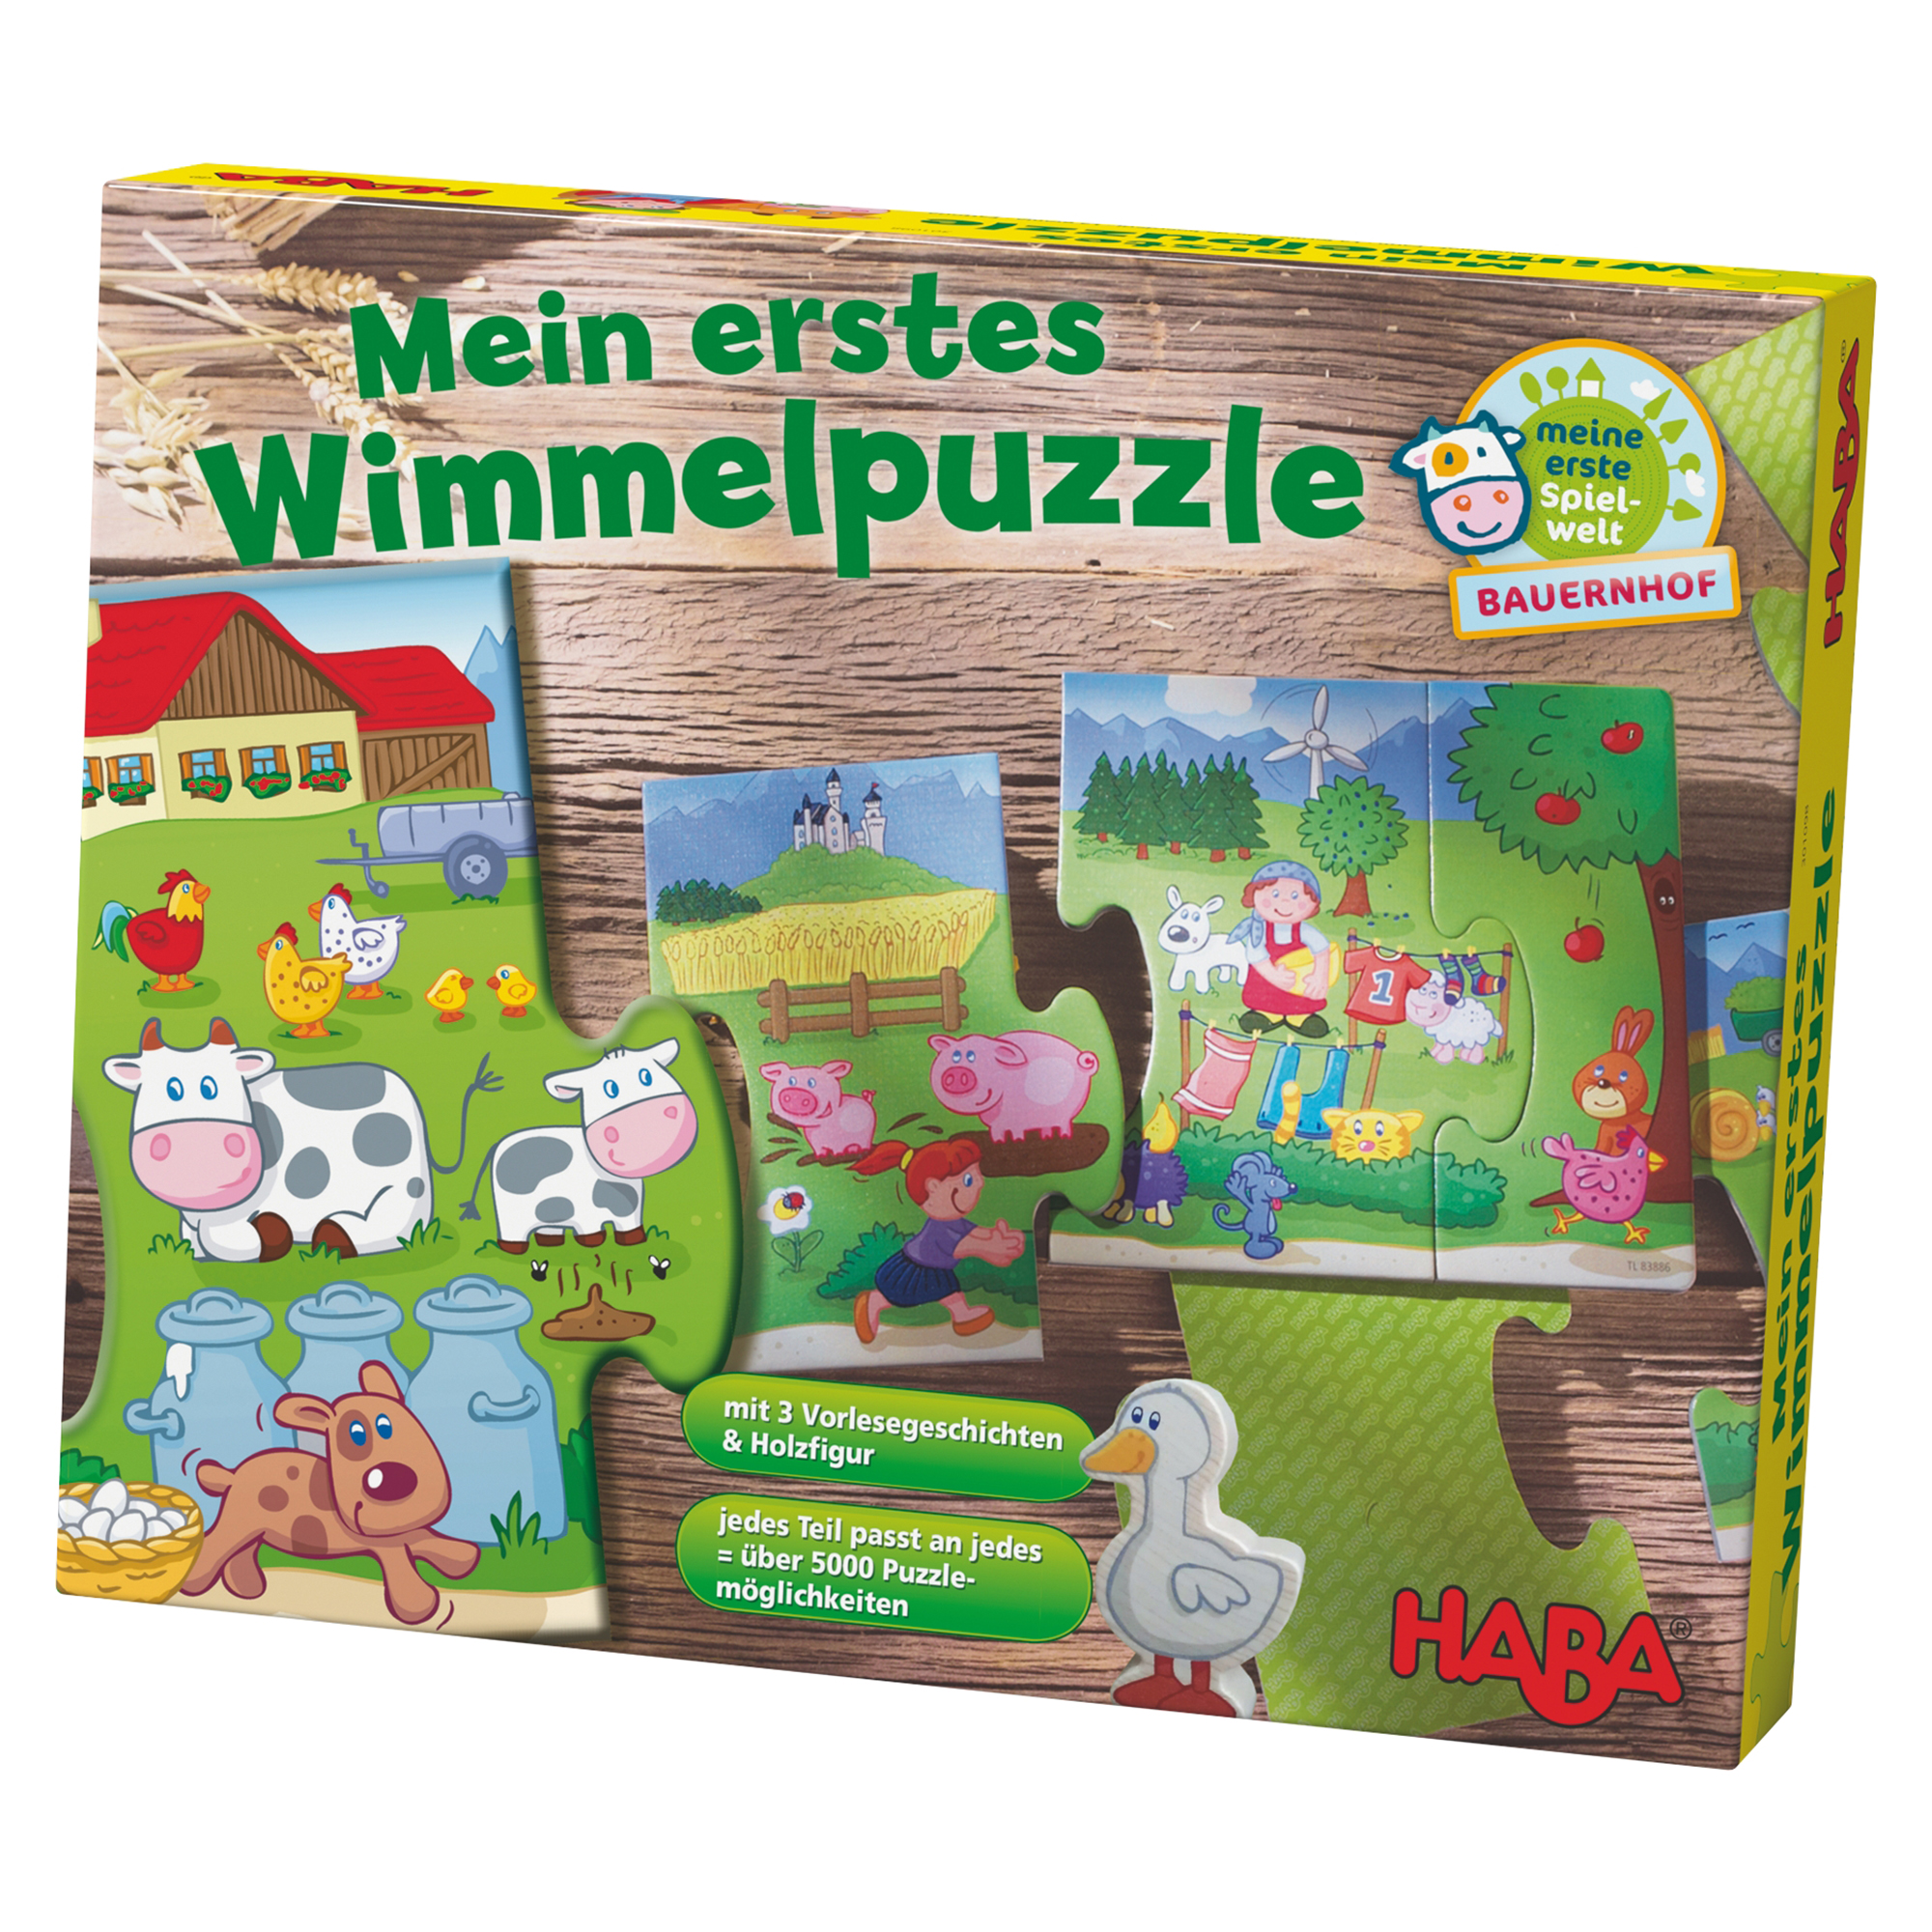 Primul meu Puzzle, Ferma, 2 ani+, HABA